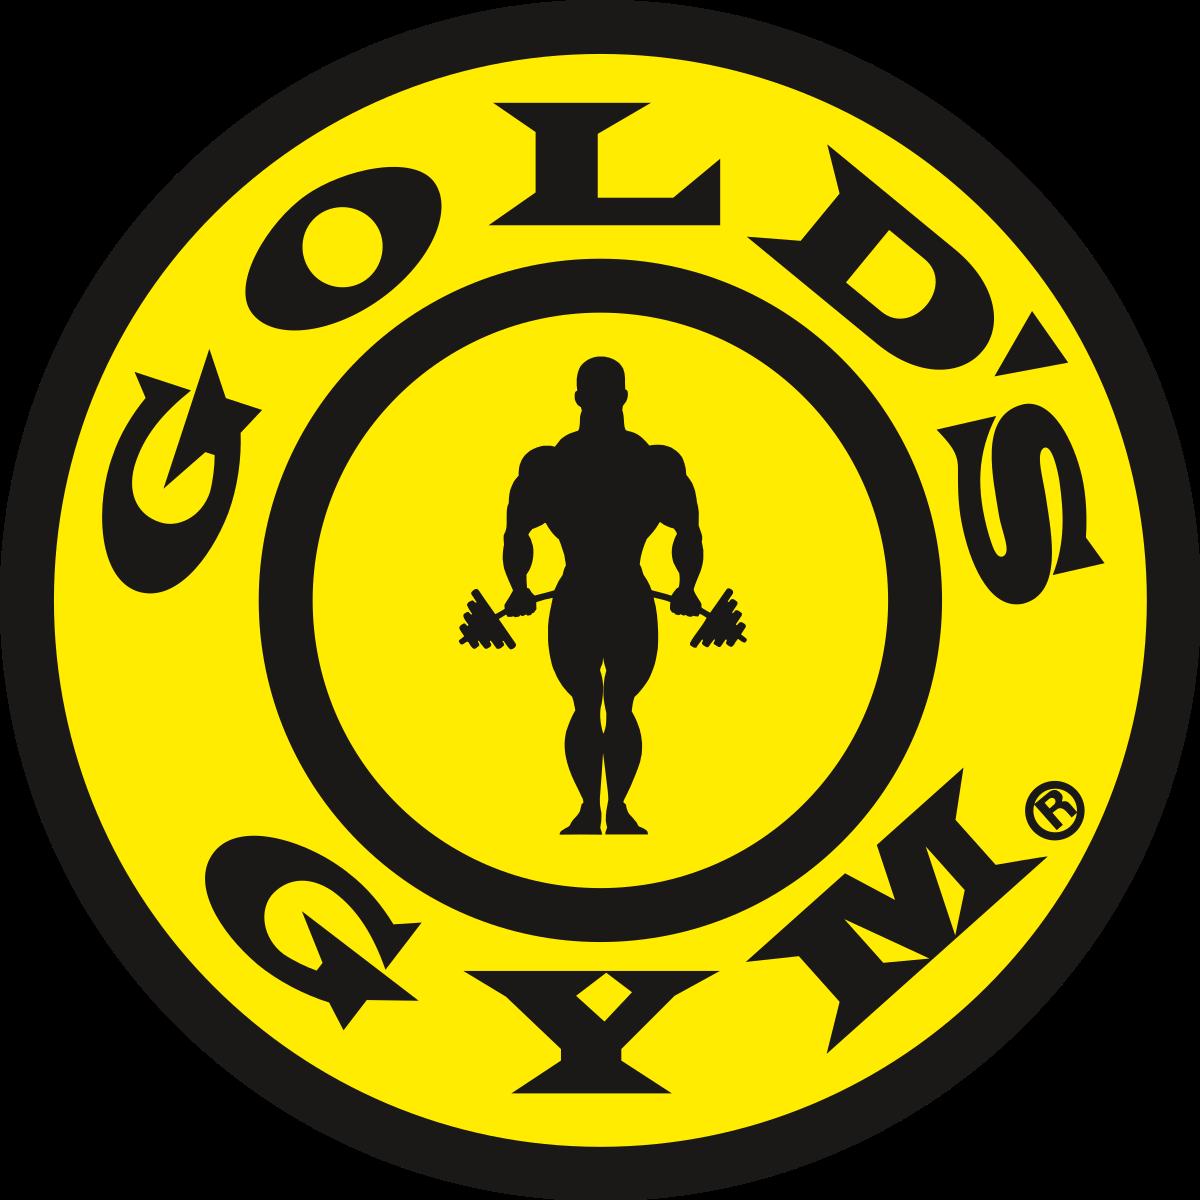 Golds Gym - Kharar - Chandigarh Image